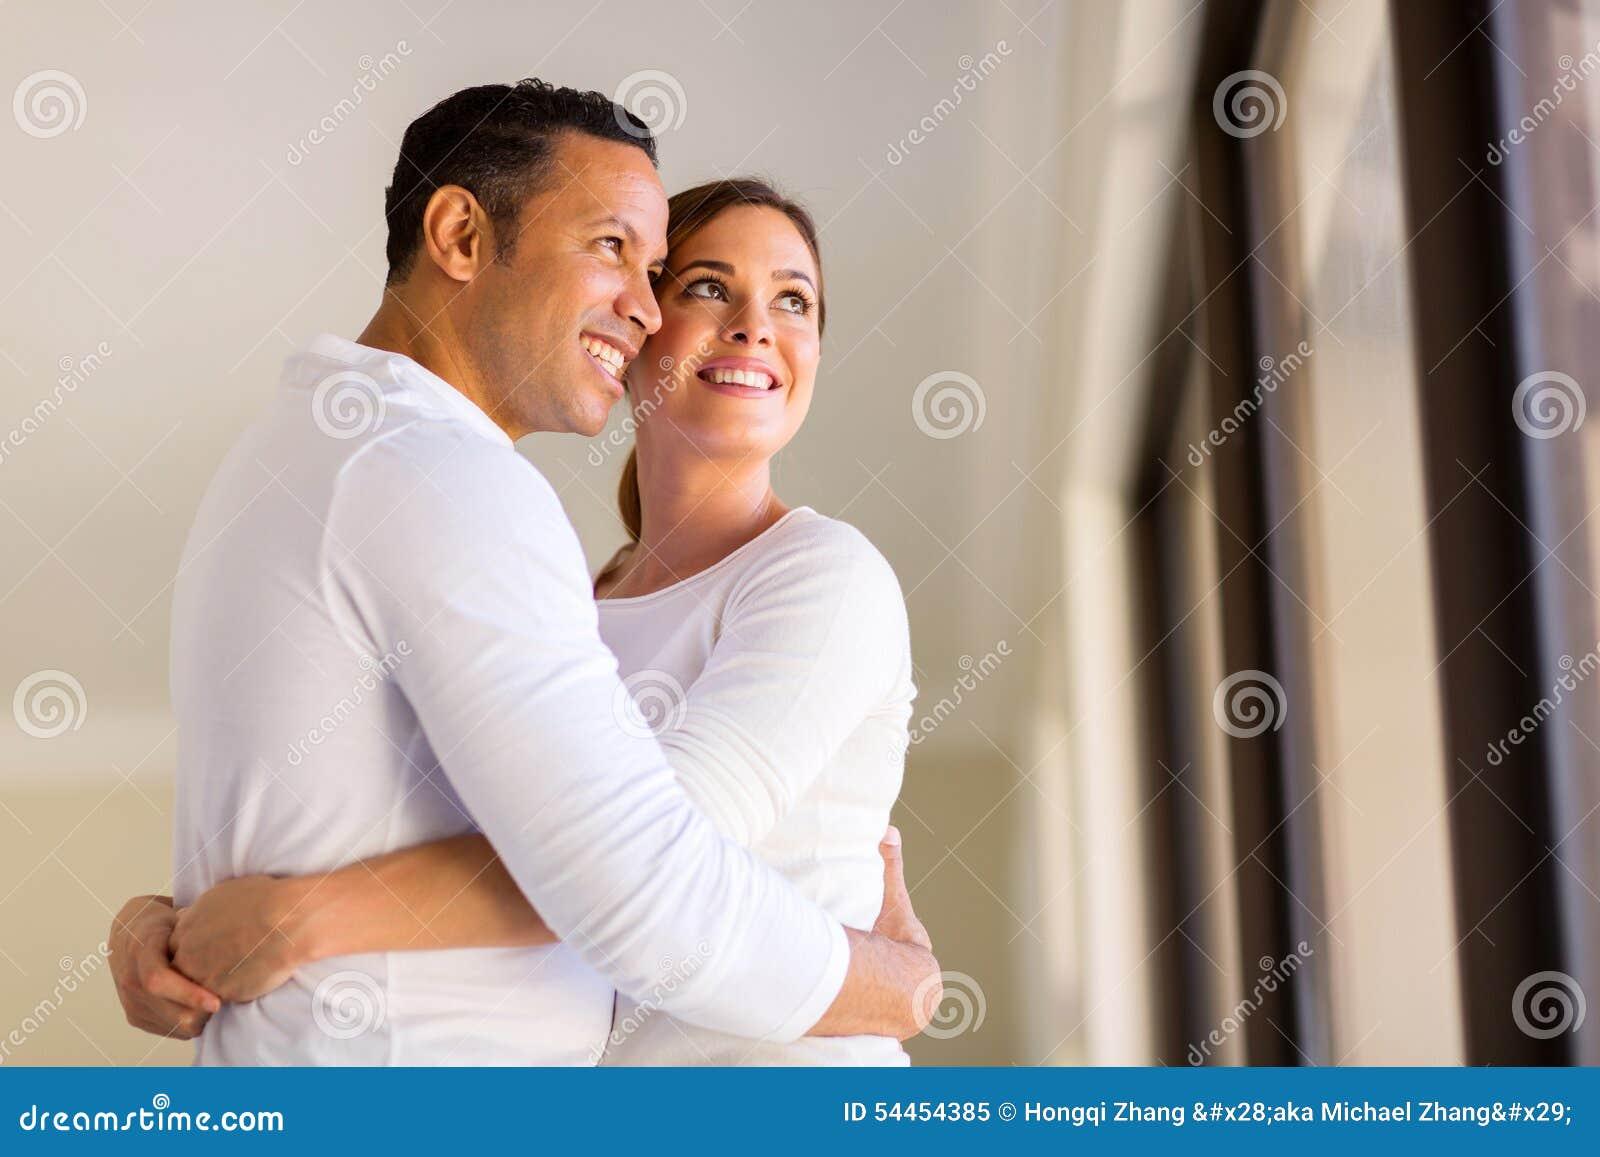 Ehemann und Frau